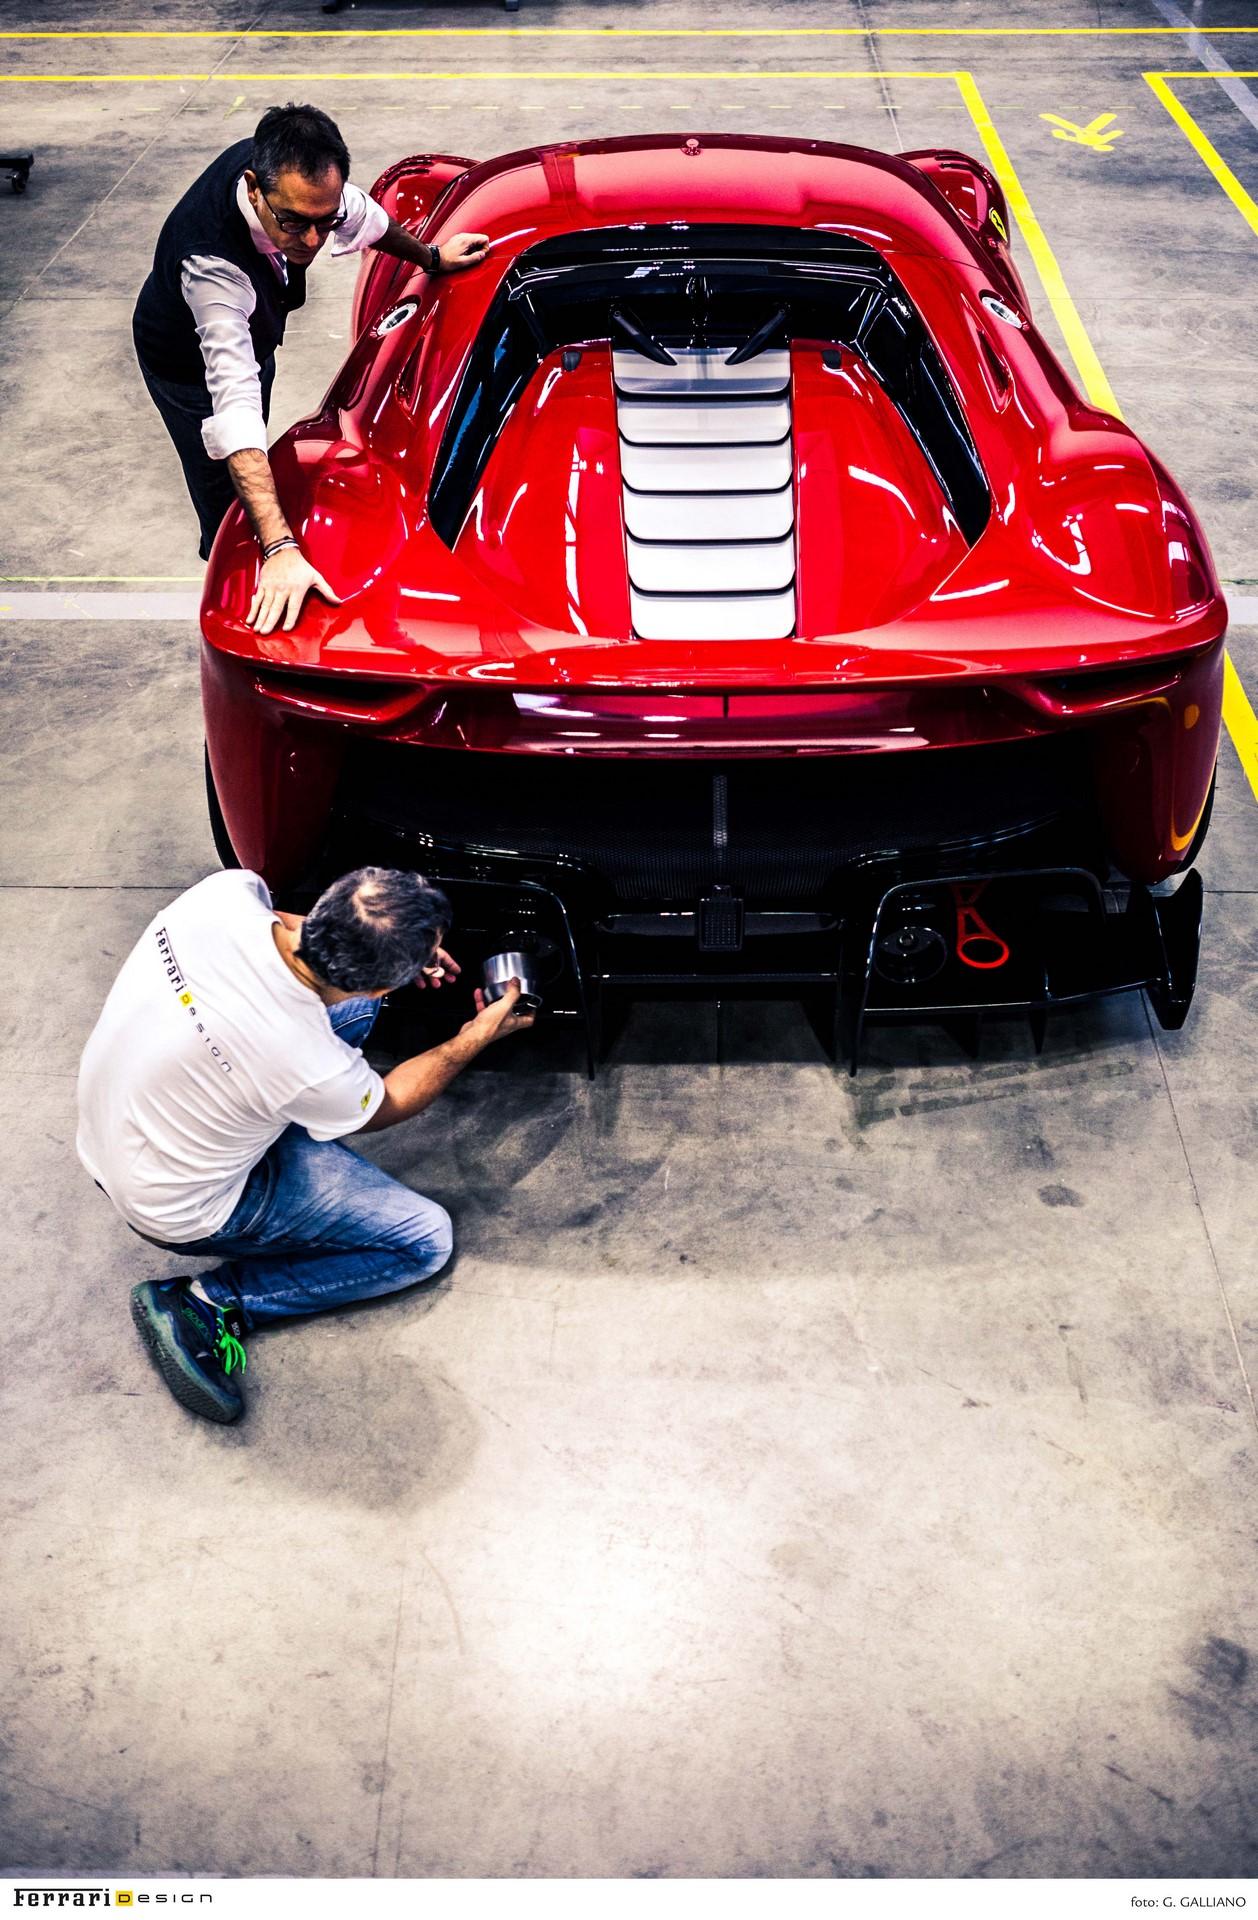 Ferrari_P80_C_styling buck_2